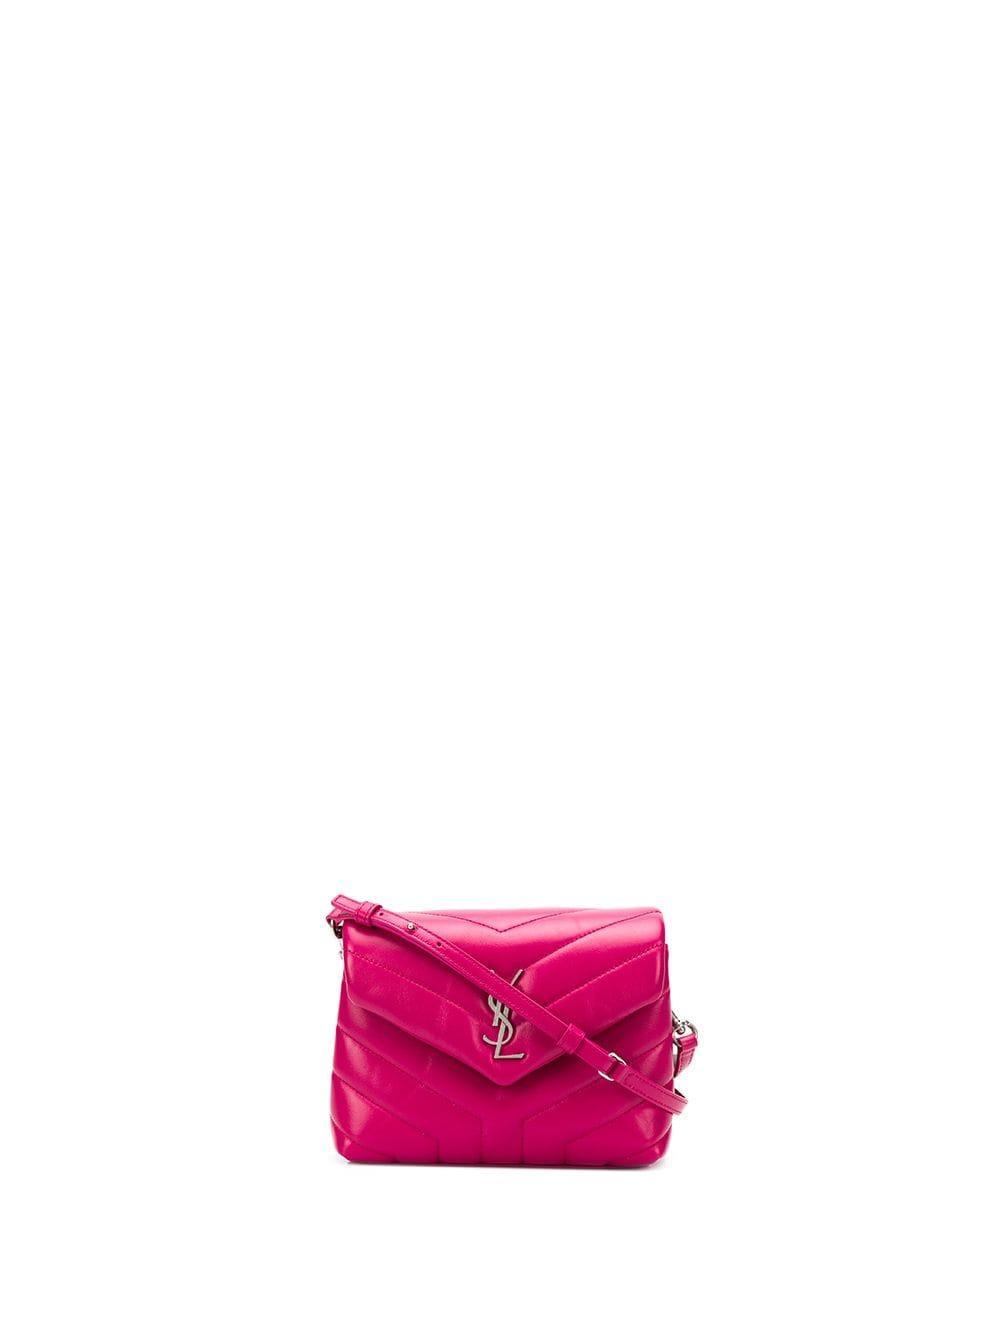 6683f6cc8b77 Saint Laurent. Women s Purple Monogram Loulou Baby Leather Crossbody Bag